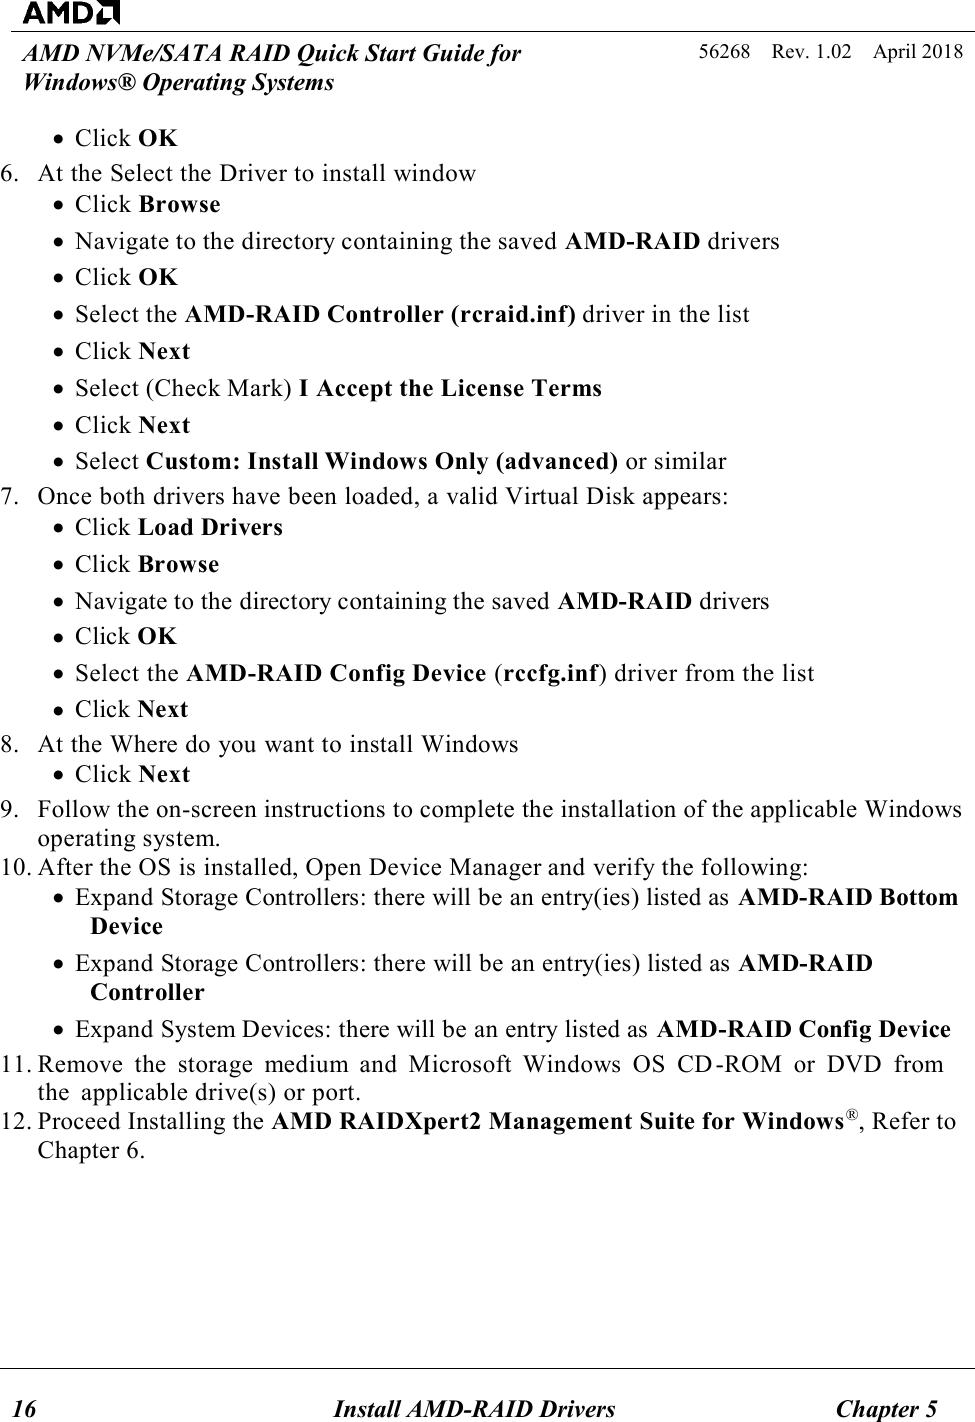 AMD NVMe/SATA RAID Quick Start Guide For Windows® Operating